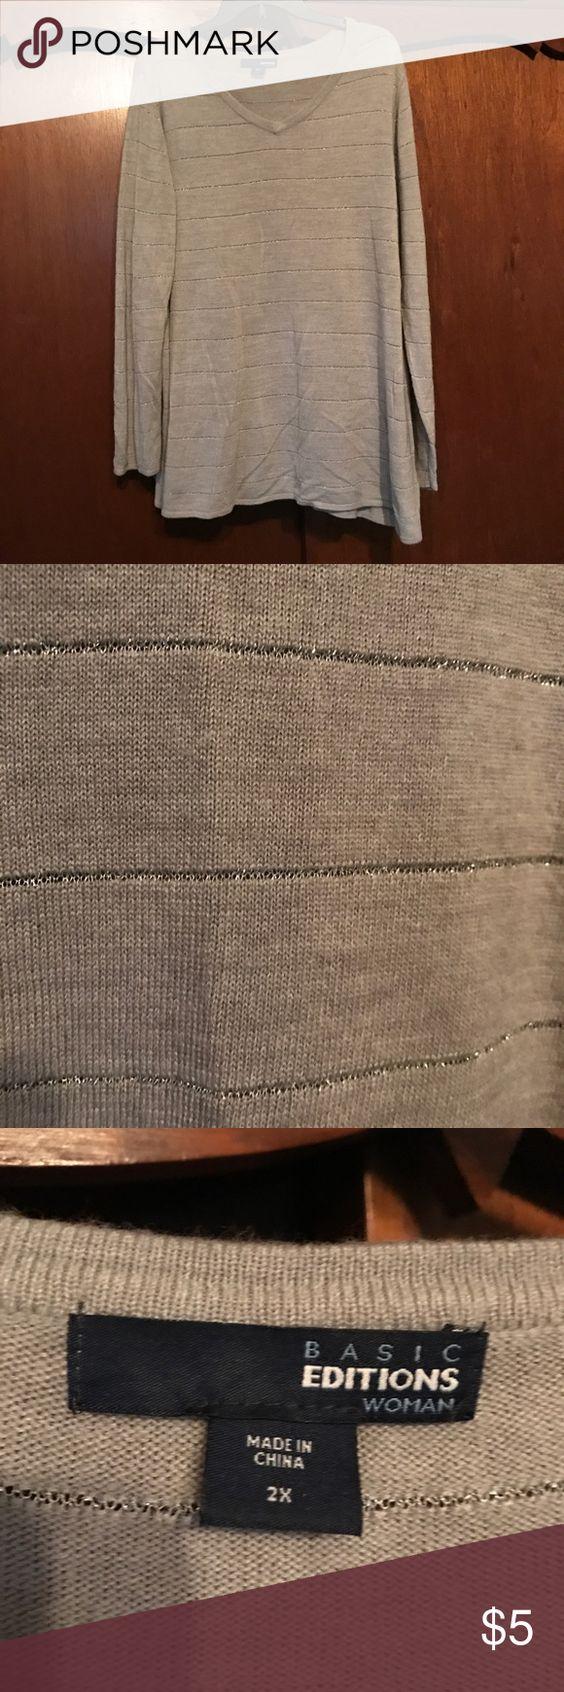 Euc gray and silver stripe sweater sz 2x Worn once 2x gray and silver stripe sweater. Very soft! basic editions Sweaters V-Necks